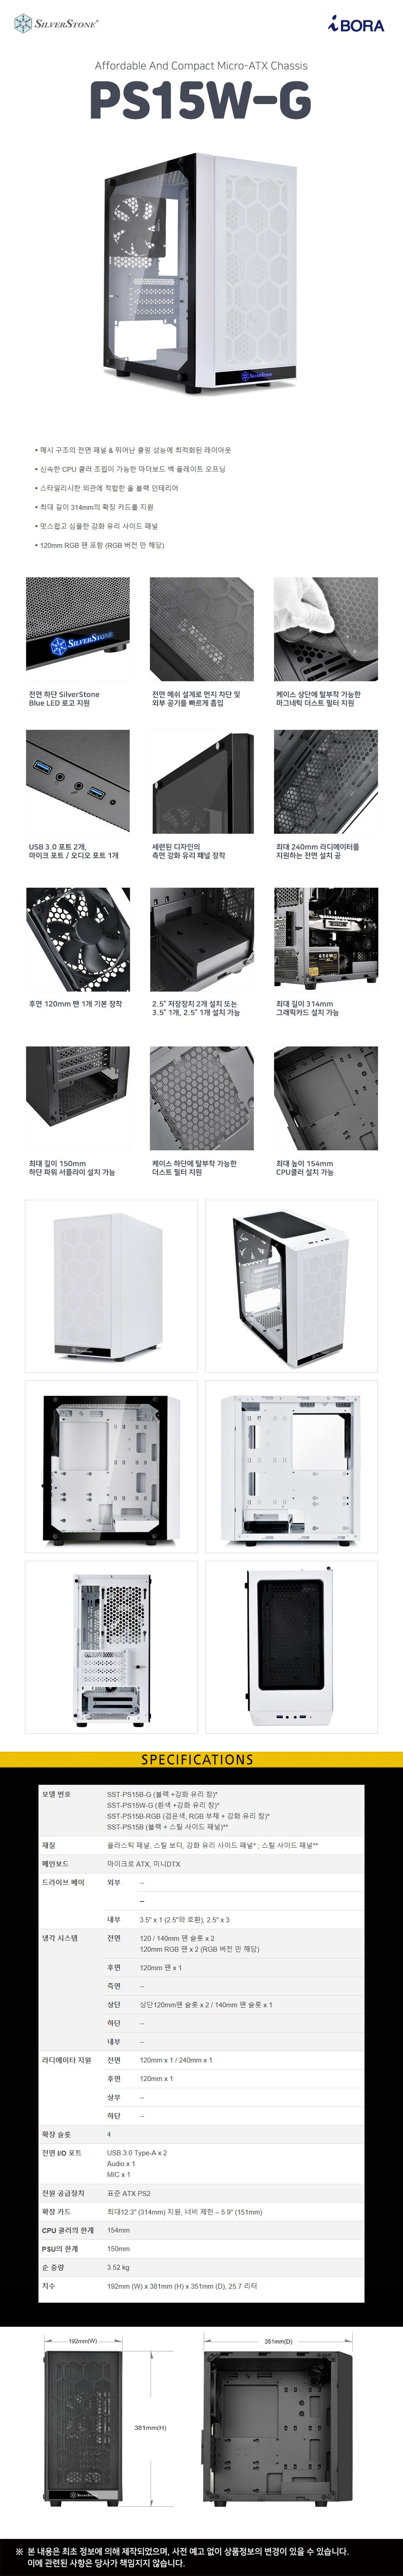 SilverStone SST-PS15-G (White)